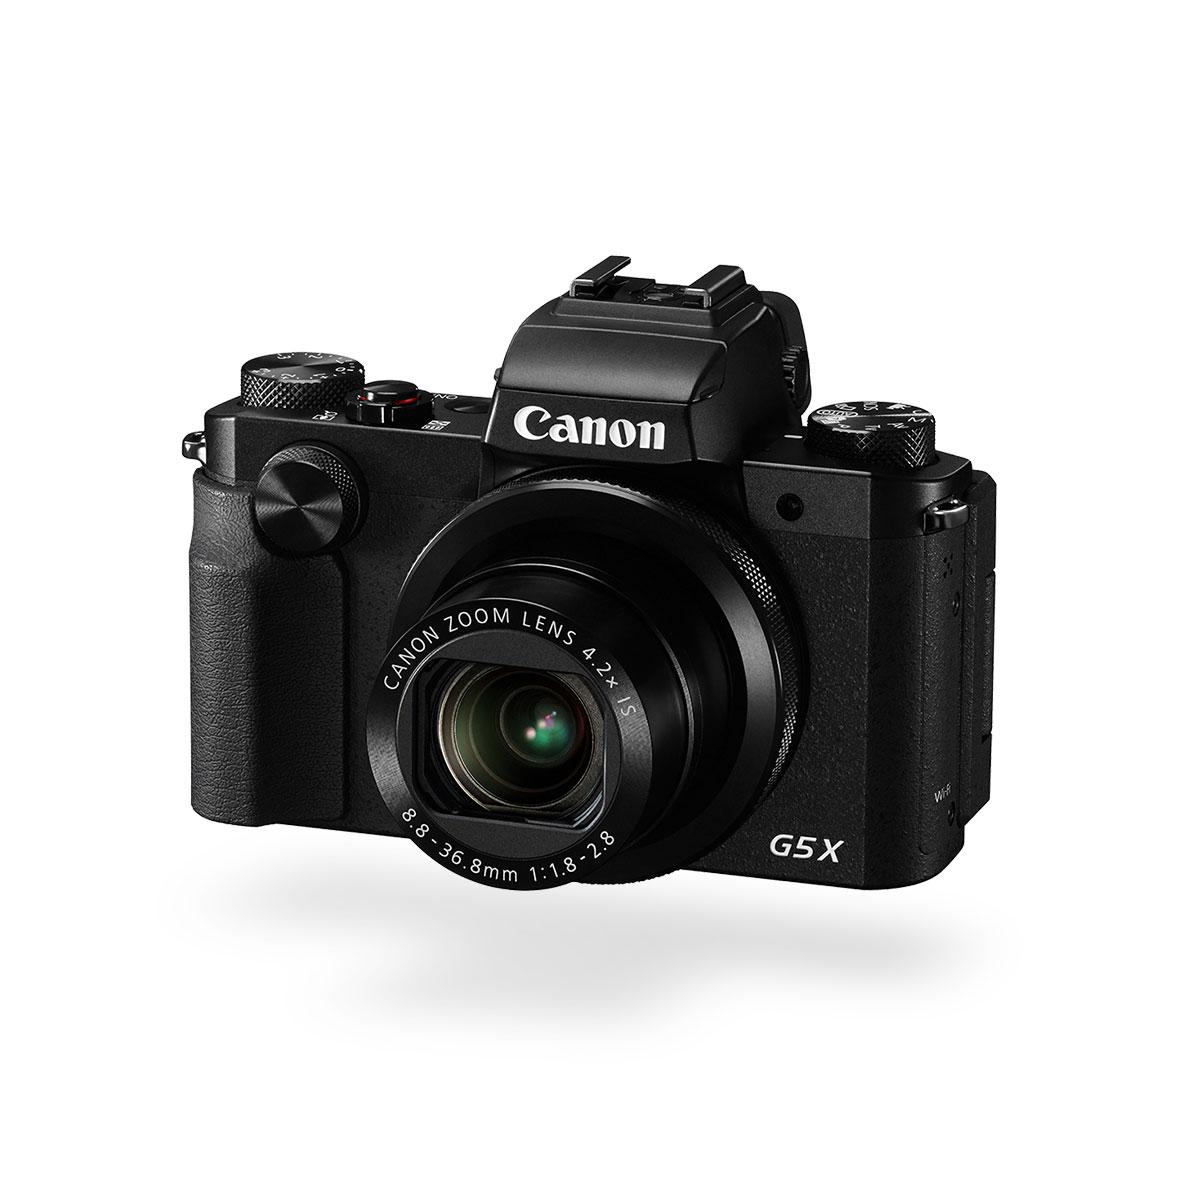 Canon PowerShot G5 X black front angled